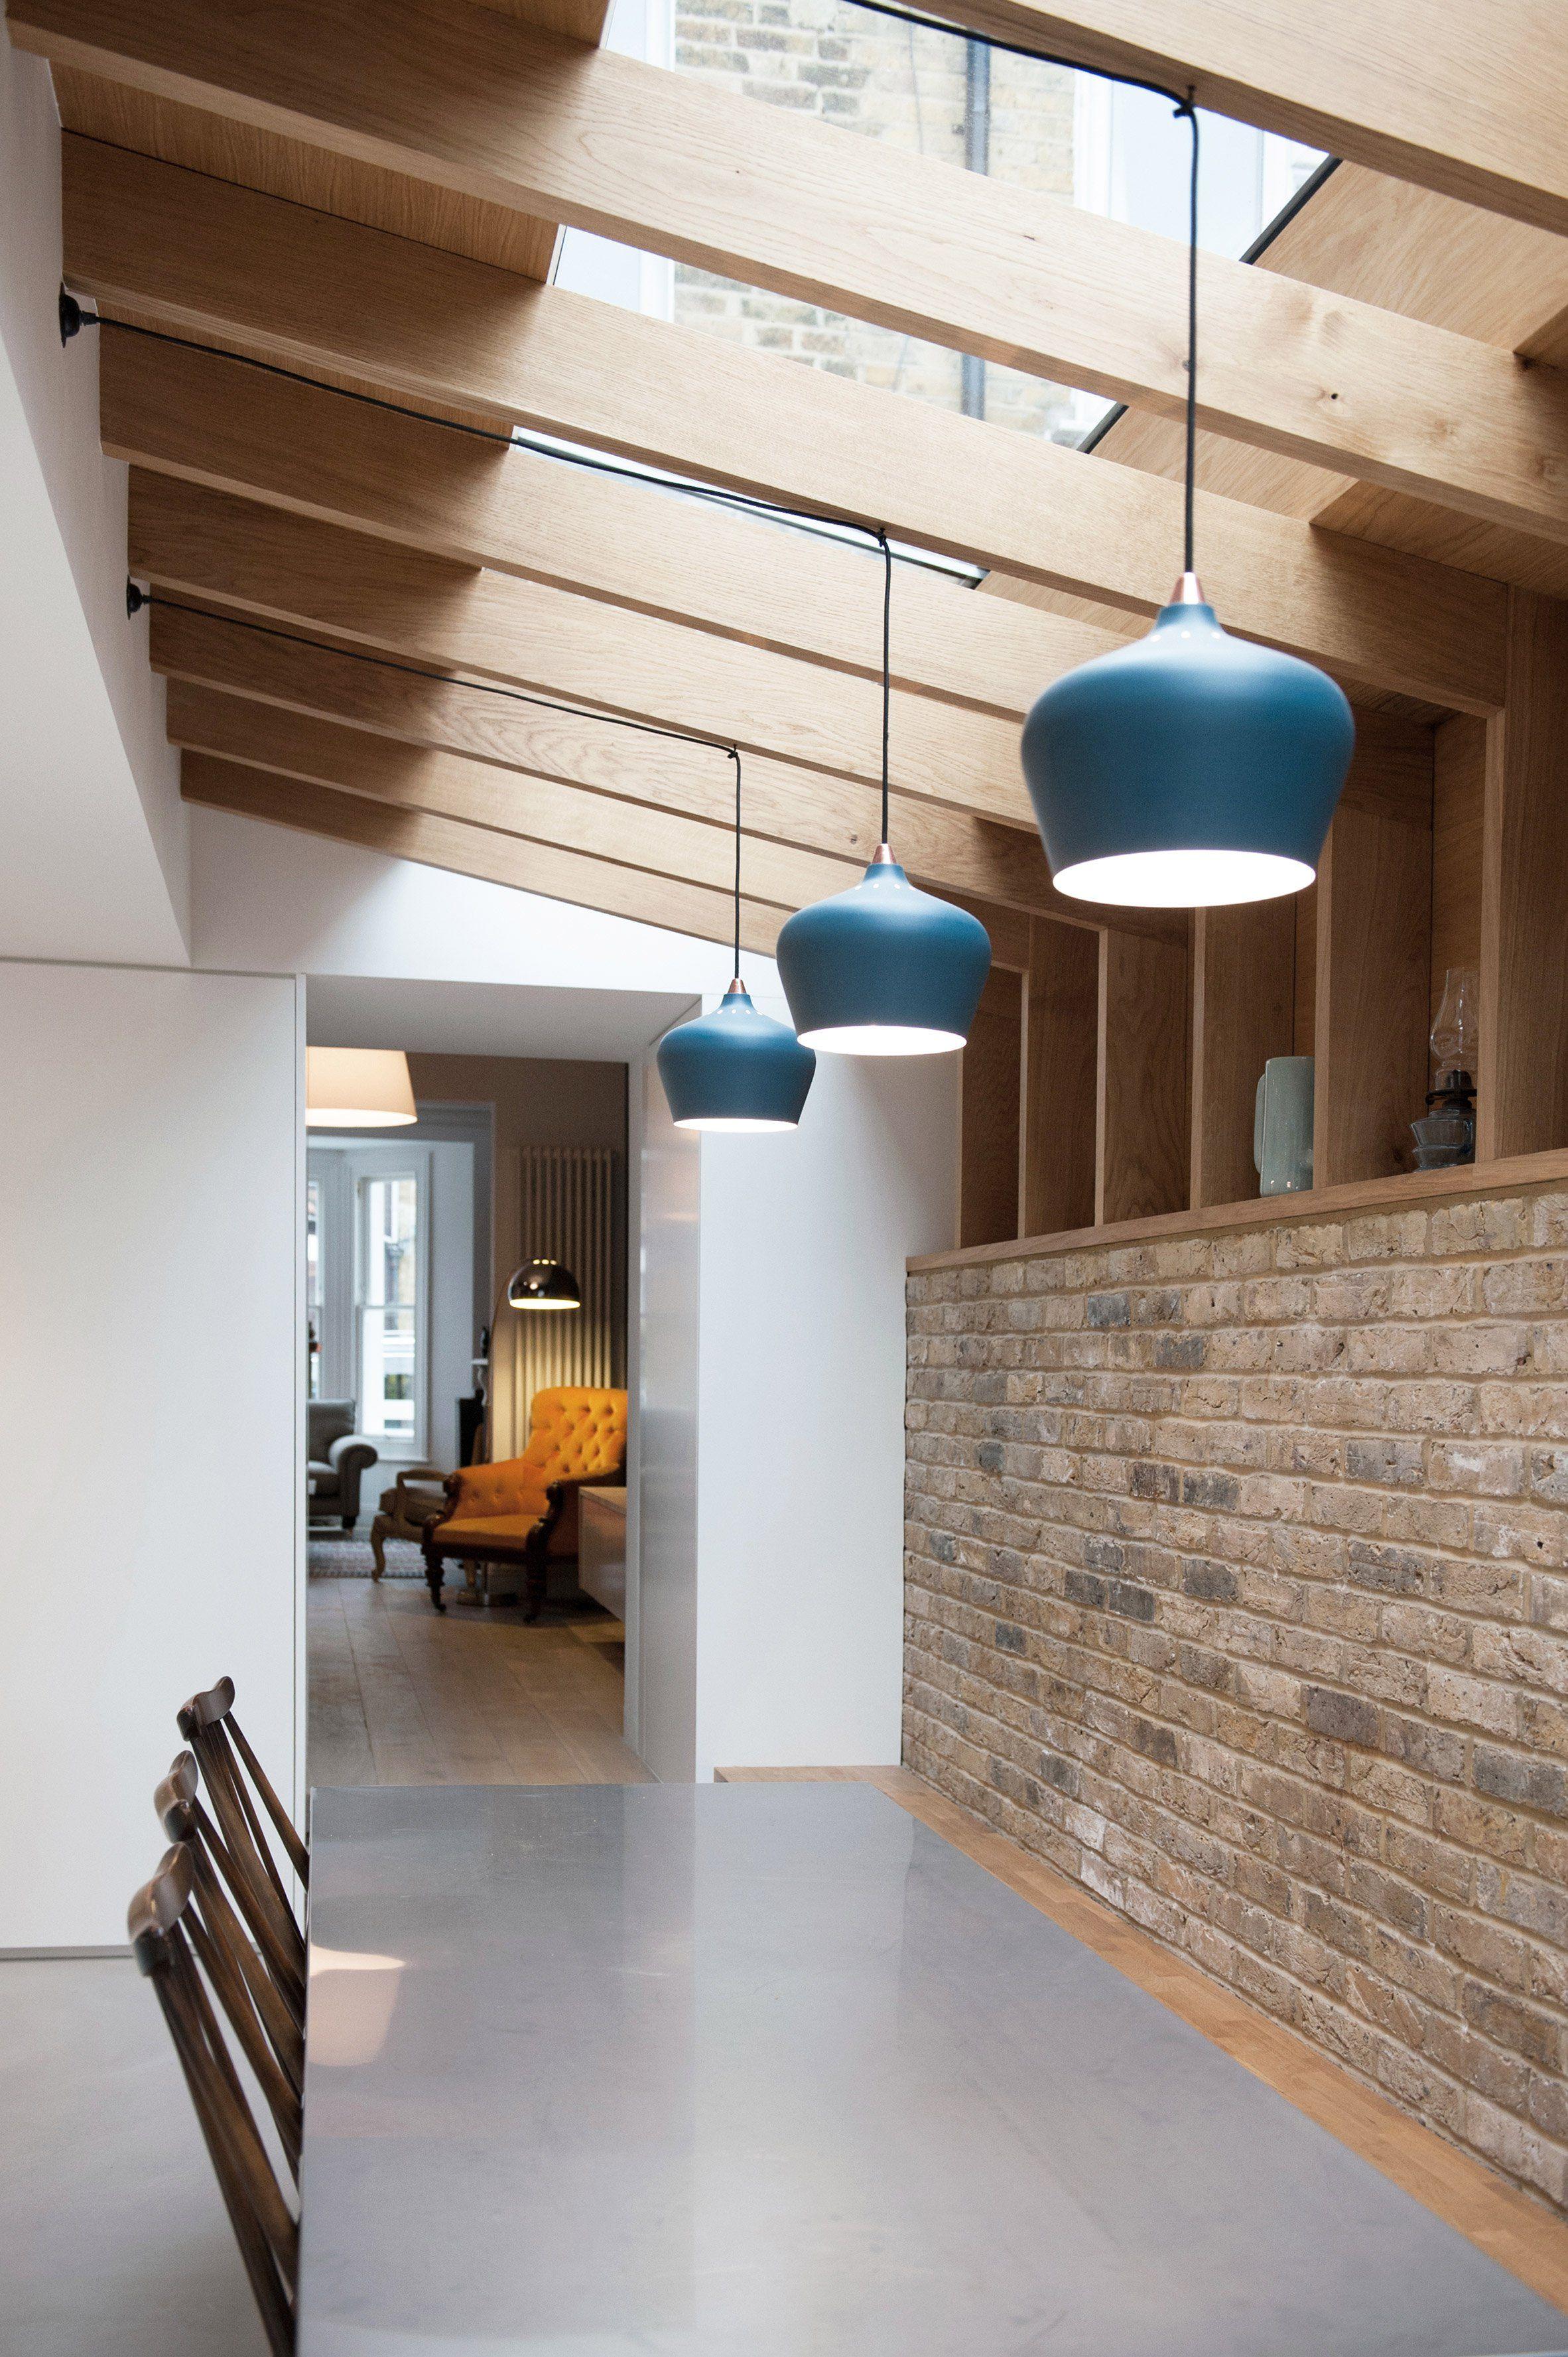 Studio 1 Architects has added a brick